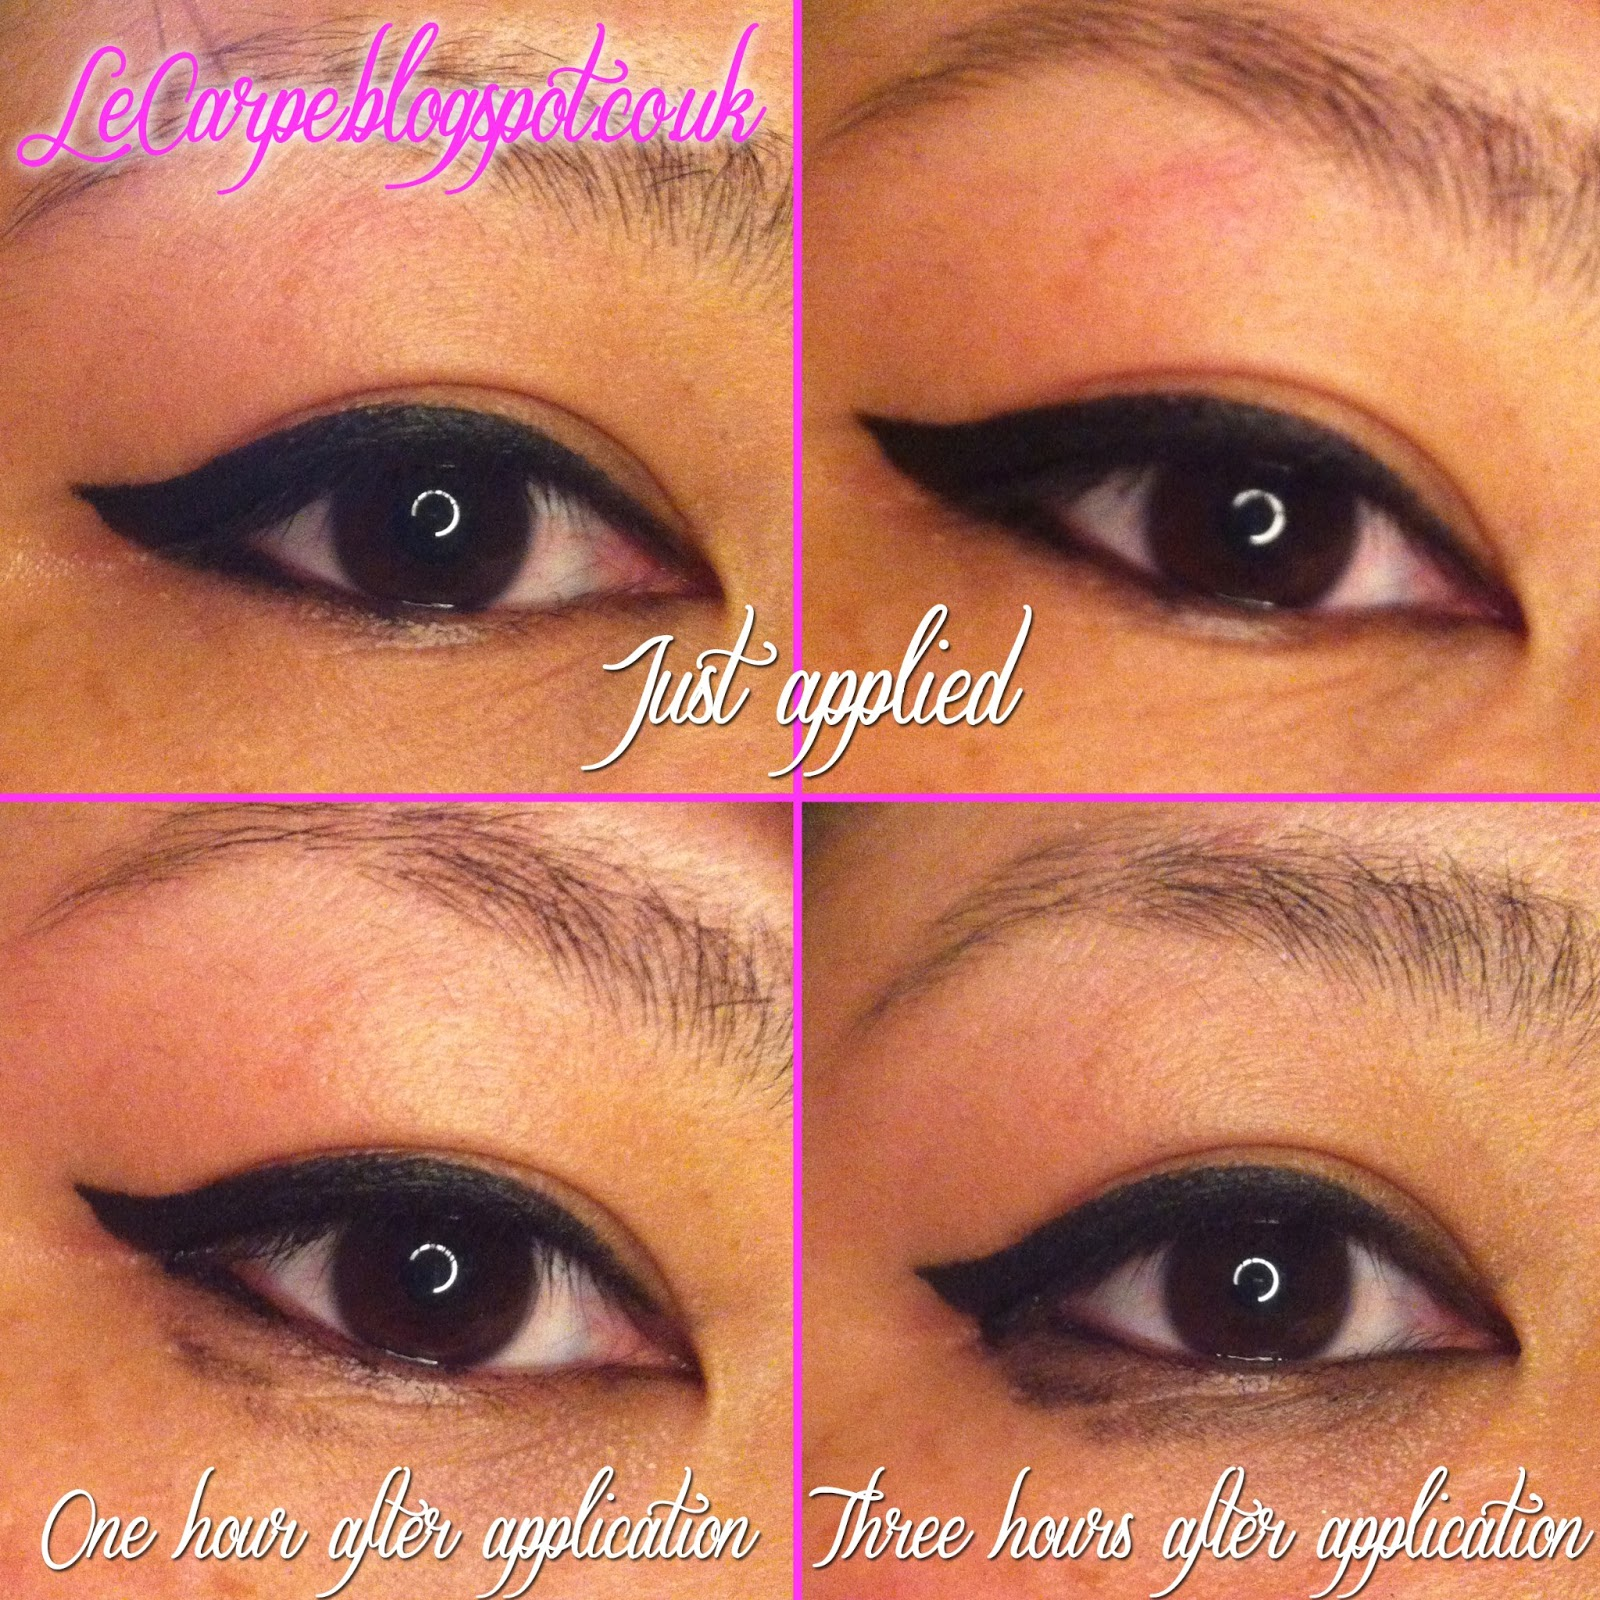 ... makeup too much mascara too much eye makeup raccoon eyes makeup scene Raccoon Eyes Makeup Crying